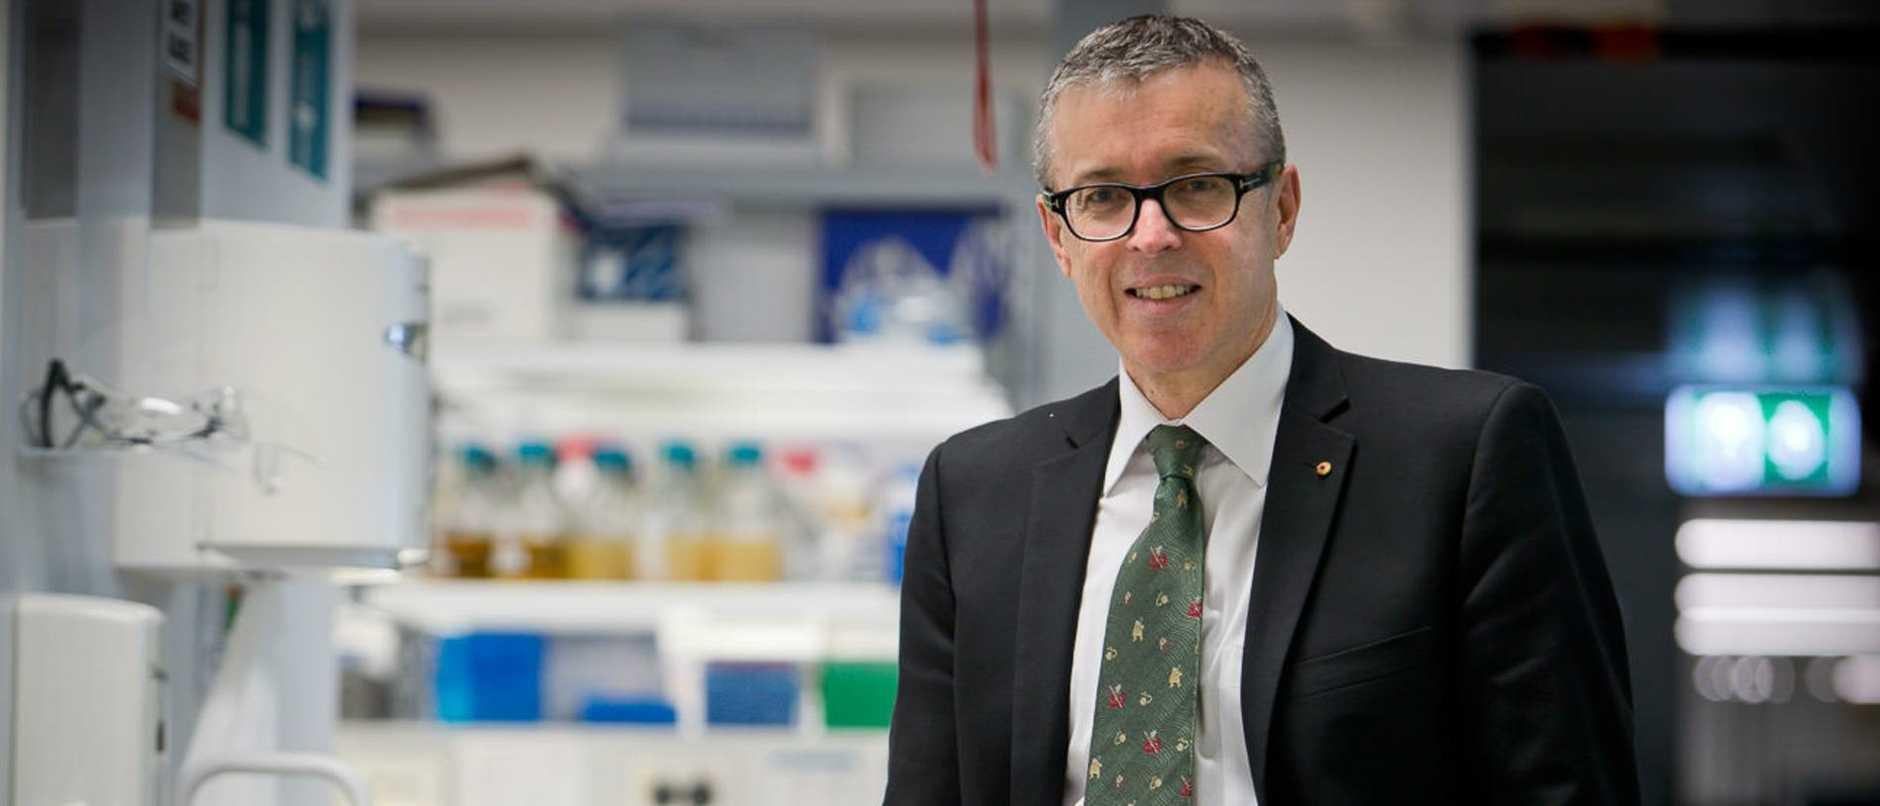 Queensland Brain Institute, Professor John McGrath, Epidemiology, Developmental Neurobiology